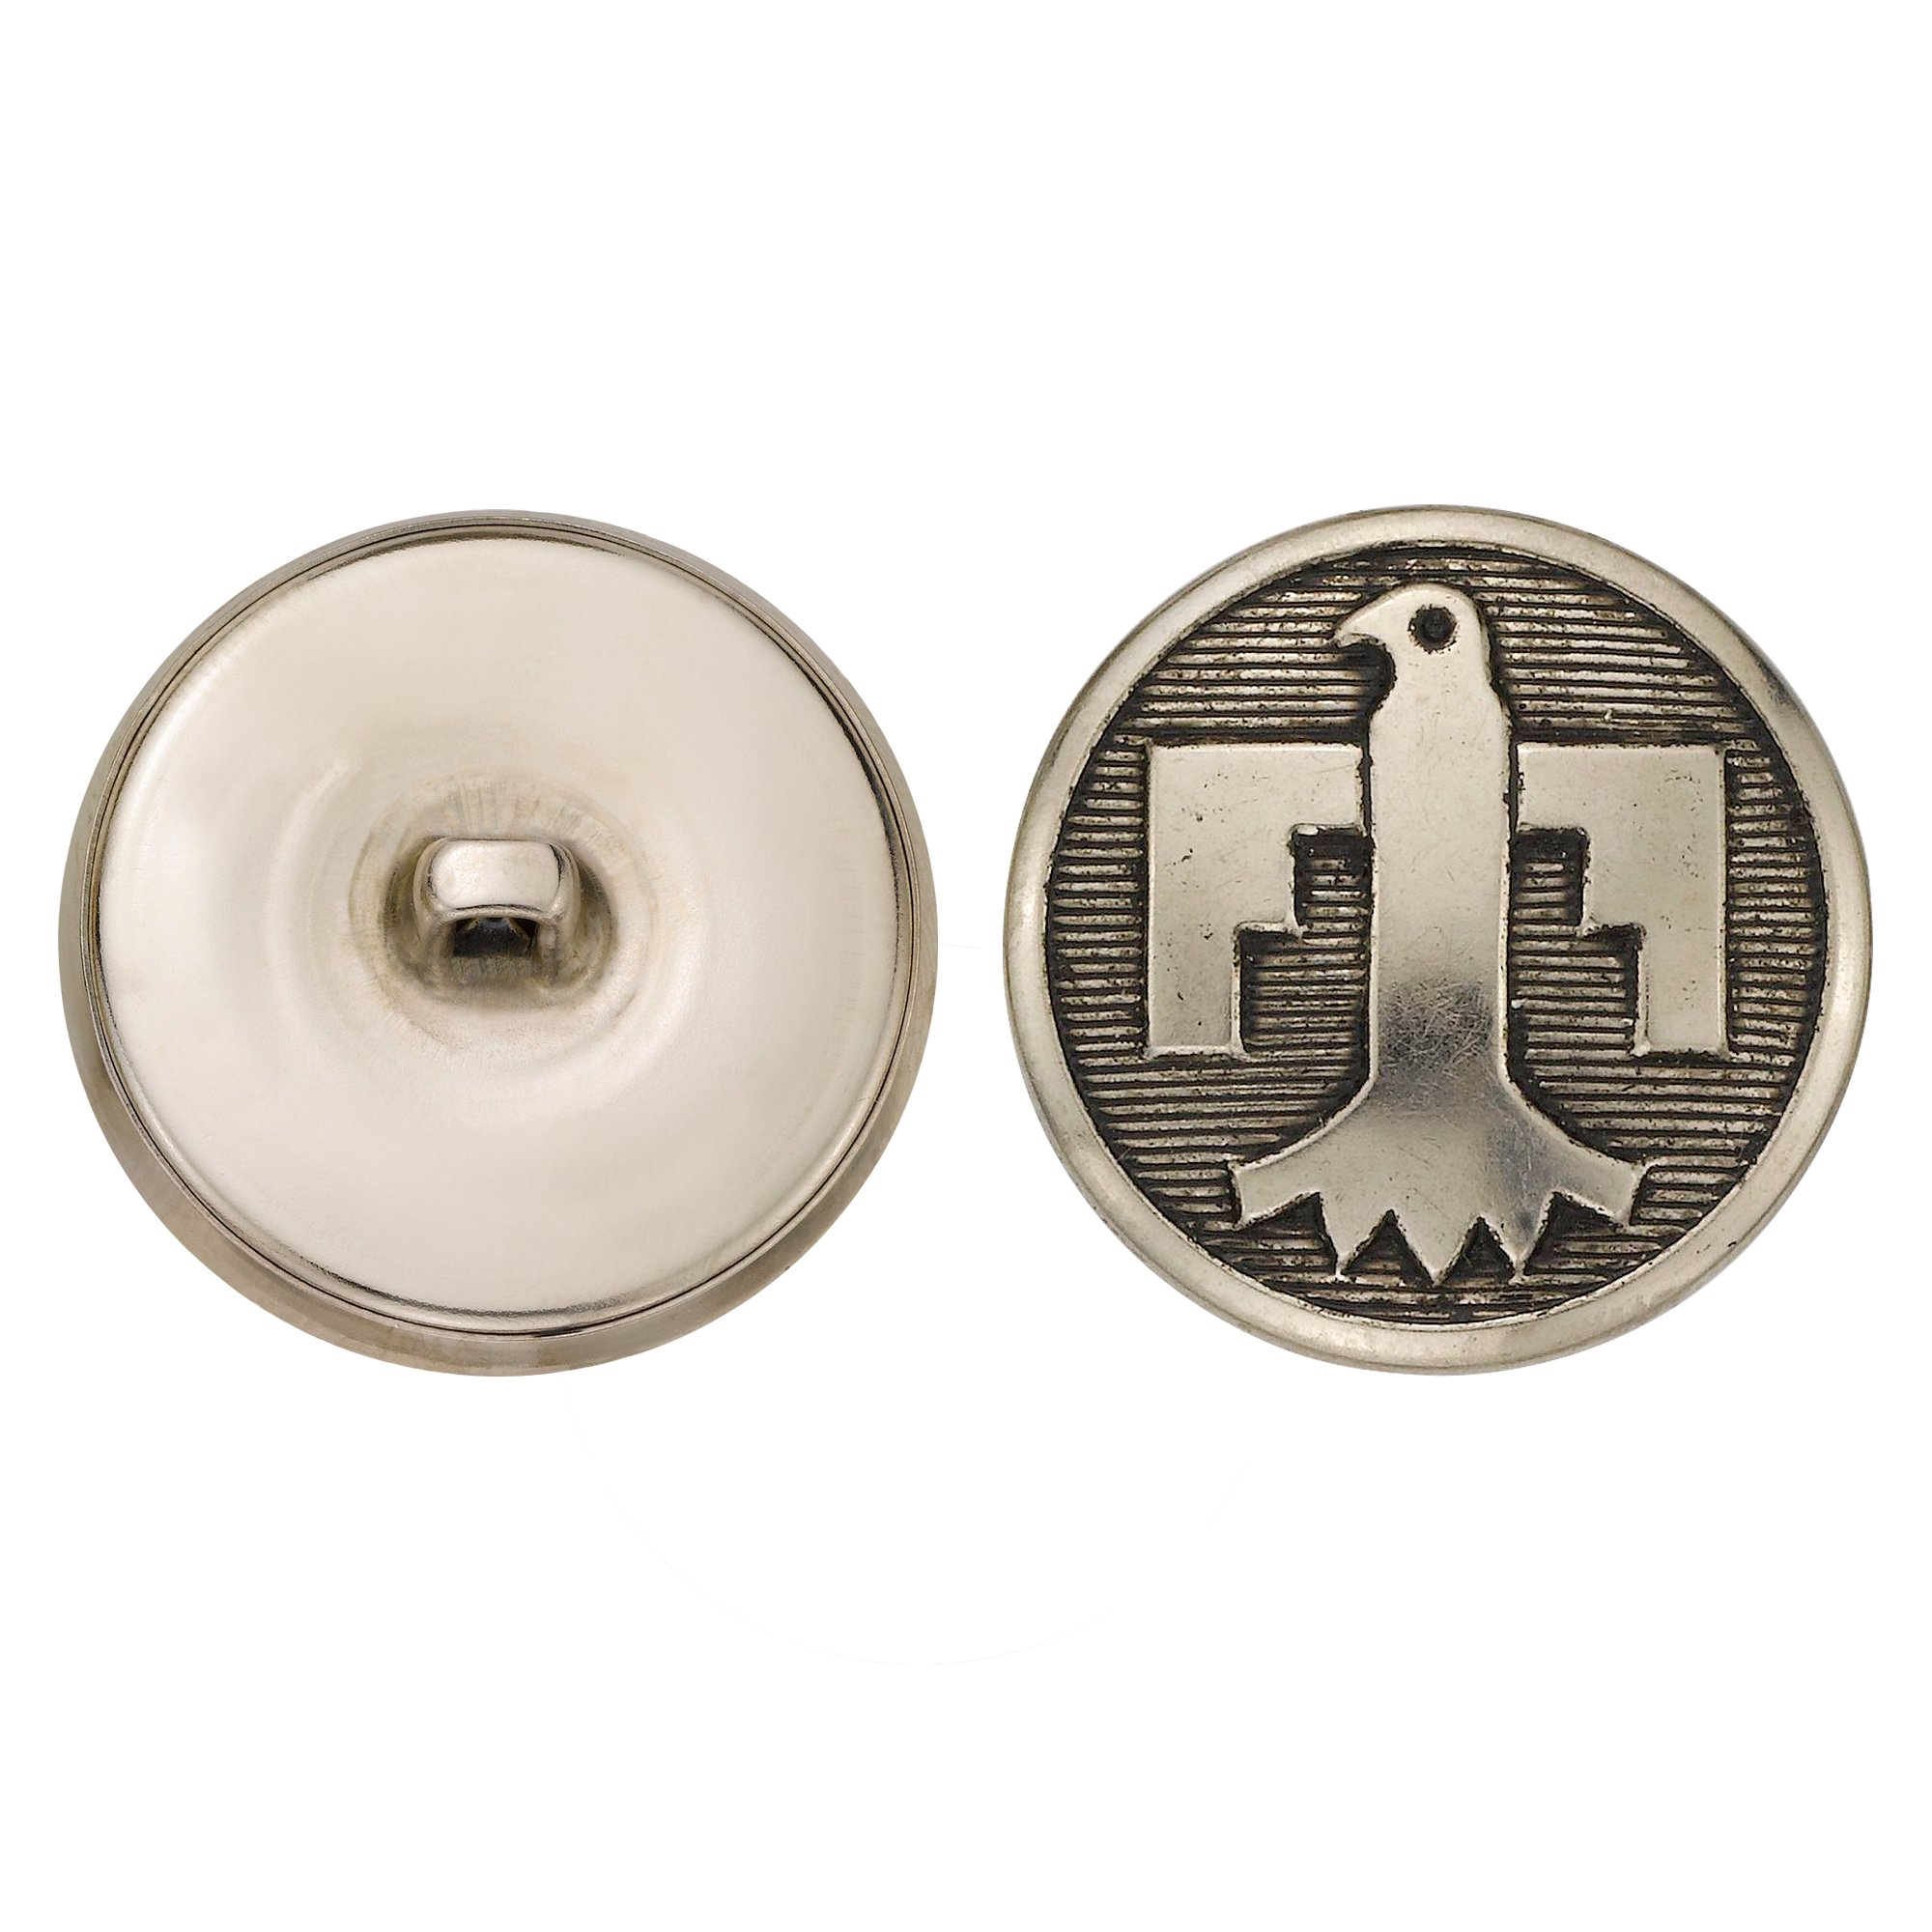 C&C Metal Products 5171 Geometric Eagle Metal Button, Size 45 Ligne, Antique Nickel, 36-Pack